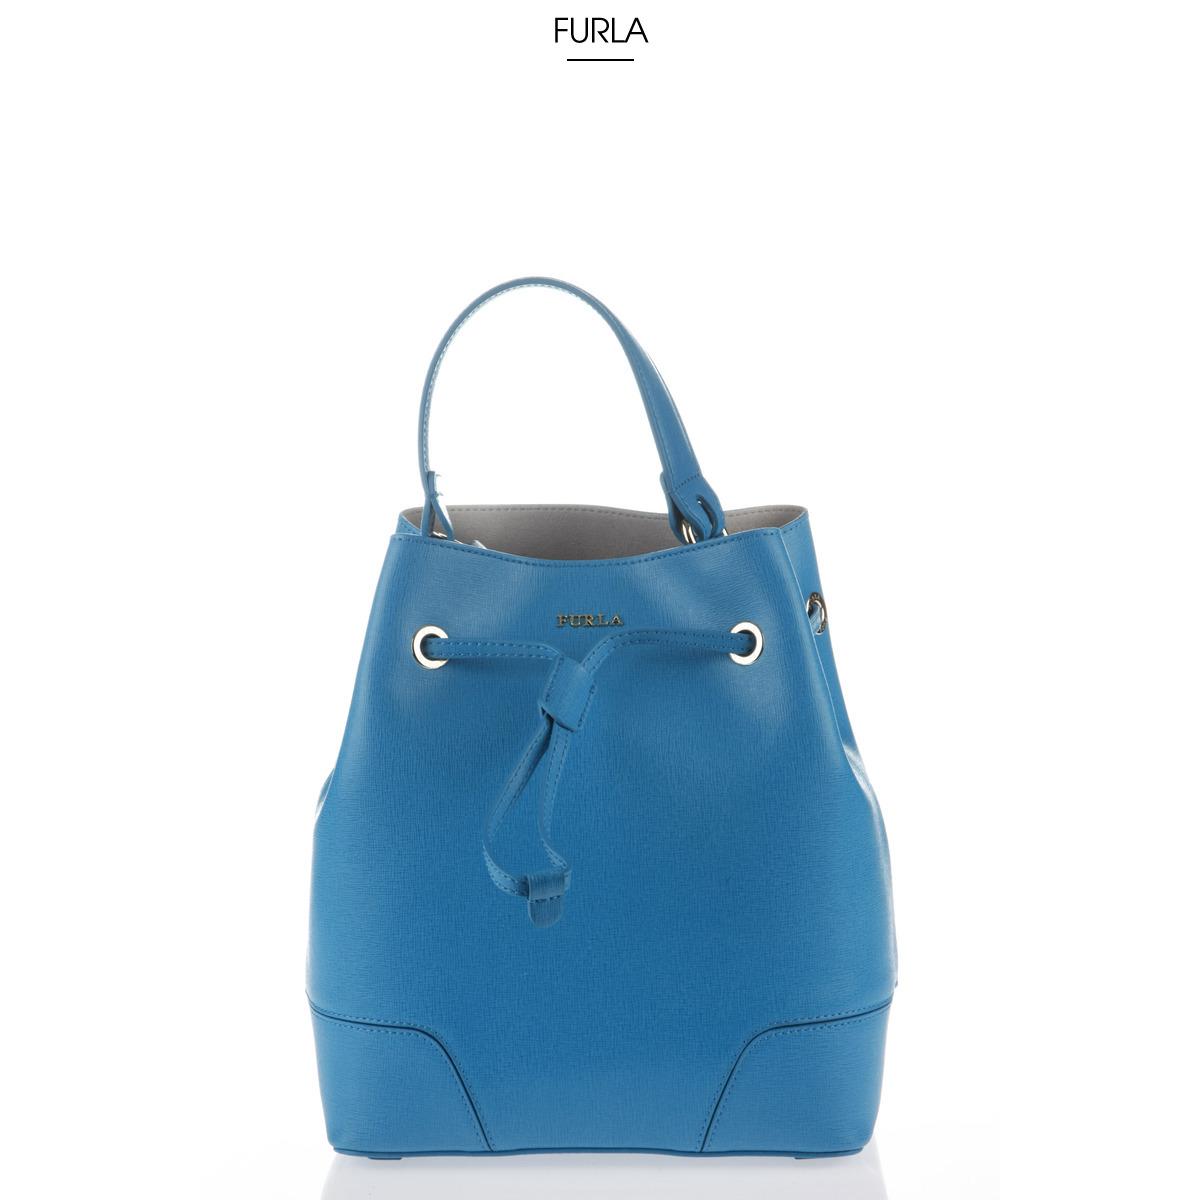 FURLA/芙拉 代购 女士新款时尚简约手提单肩包 793934